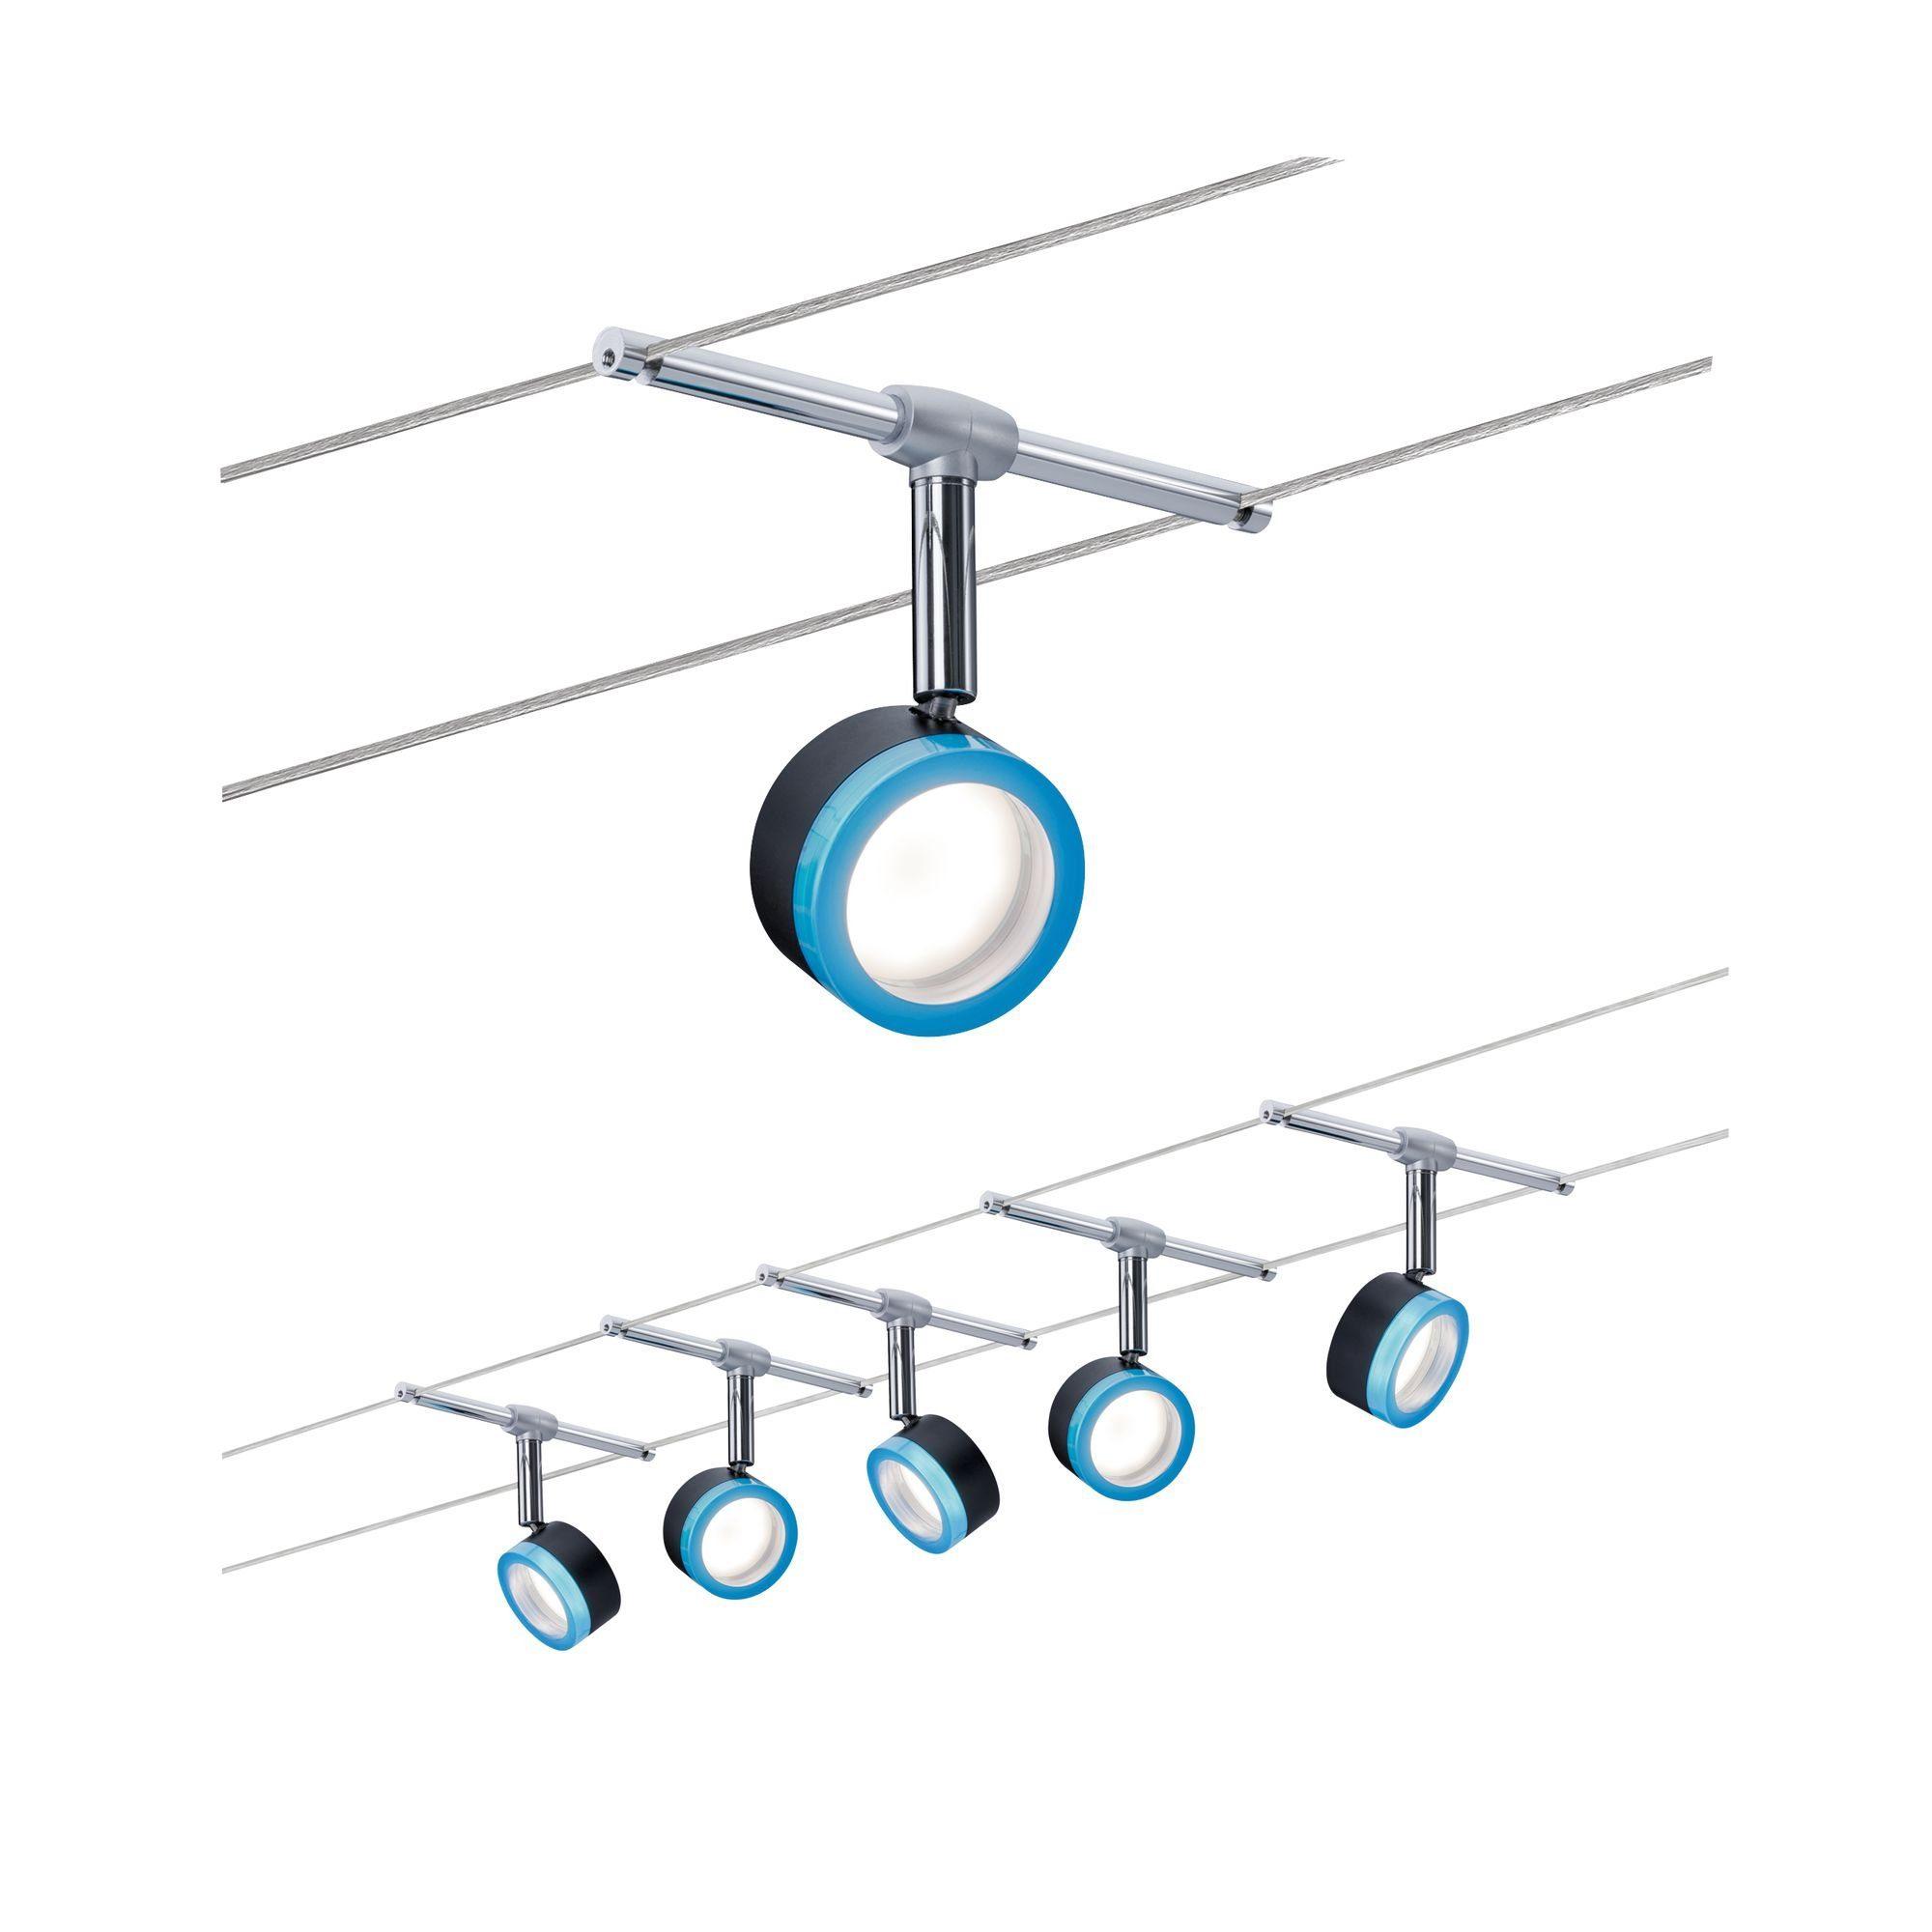 Paulmann LED Deckenleuchte Seilsystem BlueLED 5x4W Schwarz/Blau/Chrom, 1 St., Warmweiß